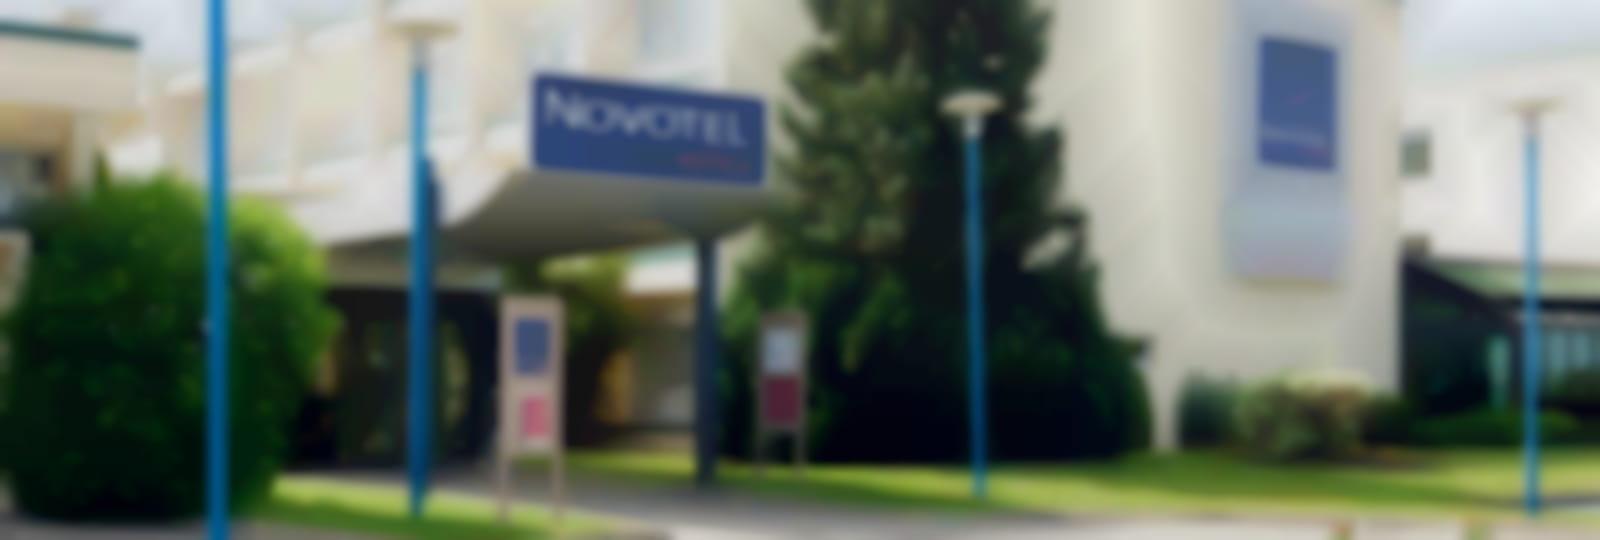 Novotel Chartres